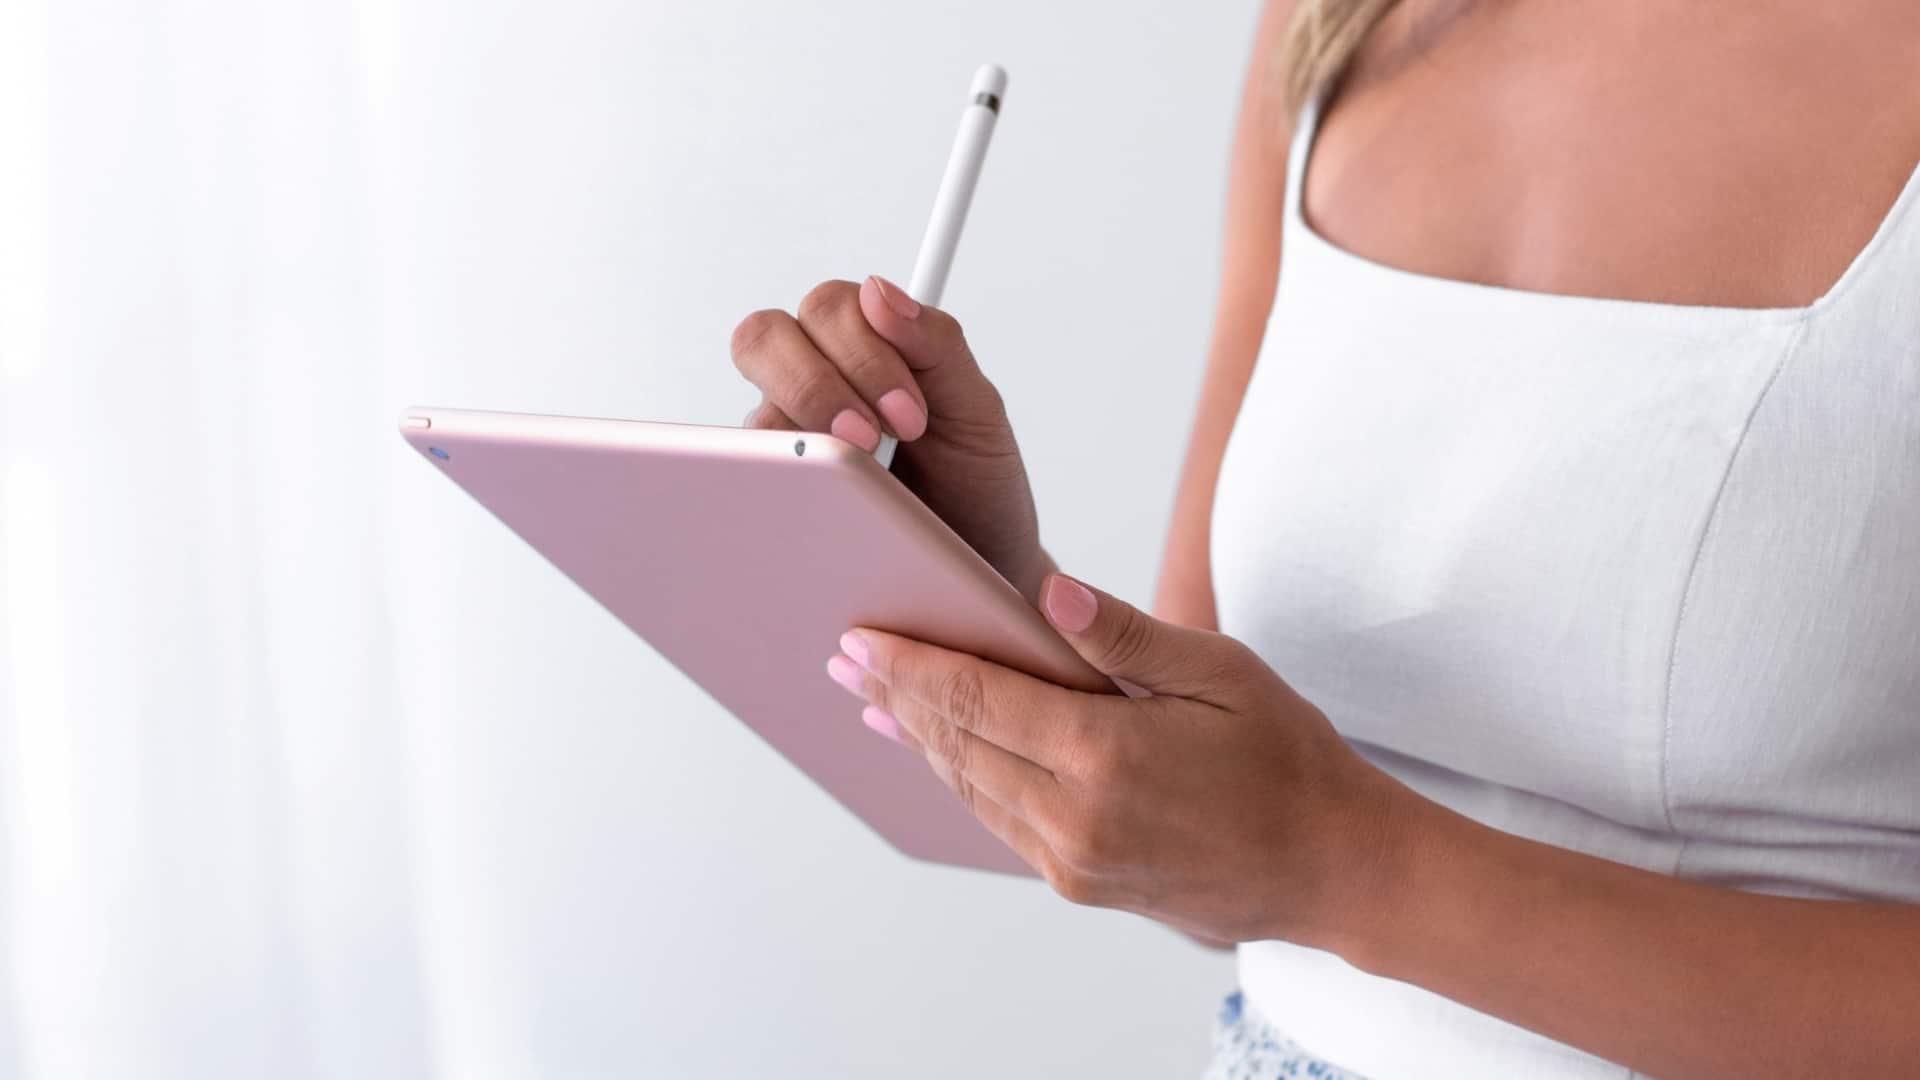 Female business owner designing her website on a laptop